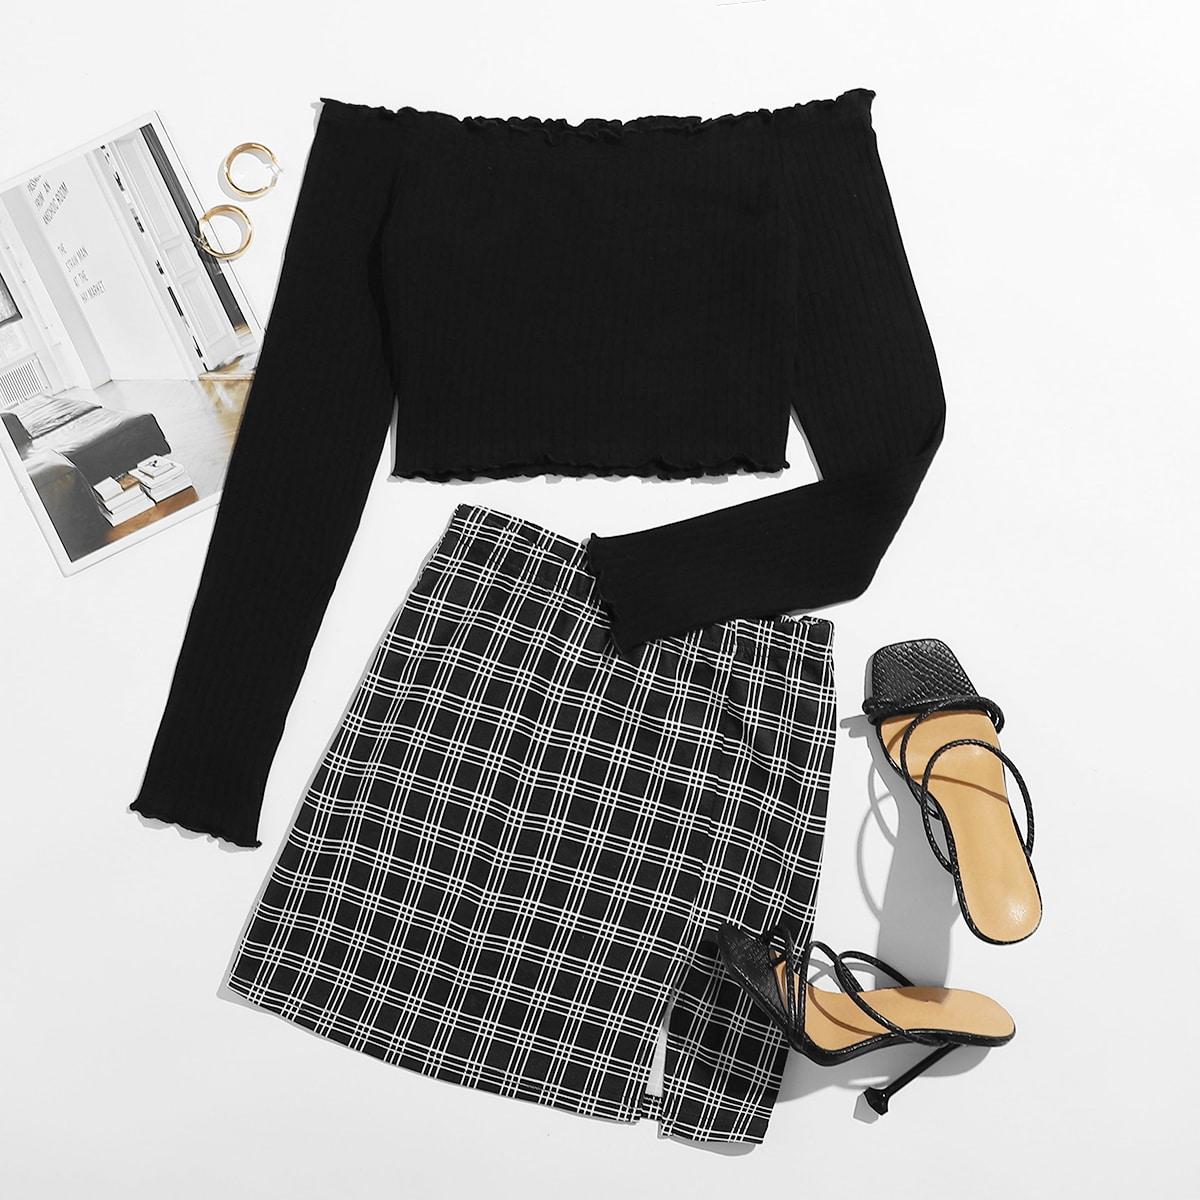 SHEIN / Lettuce-Edge Crop Top & Plaid Mini Skirt Set